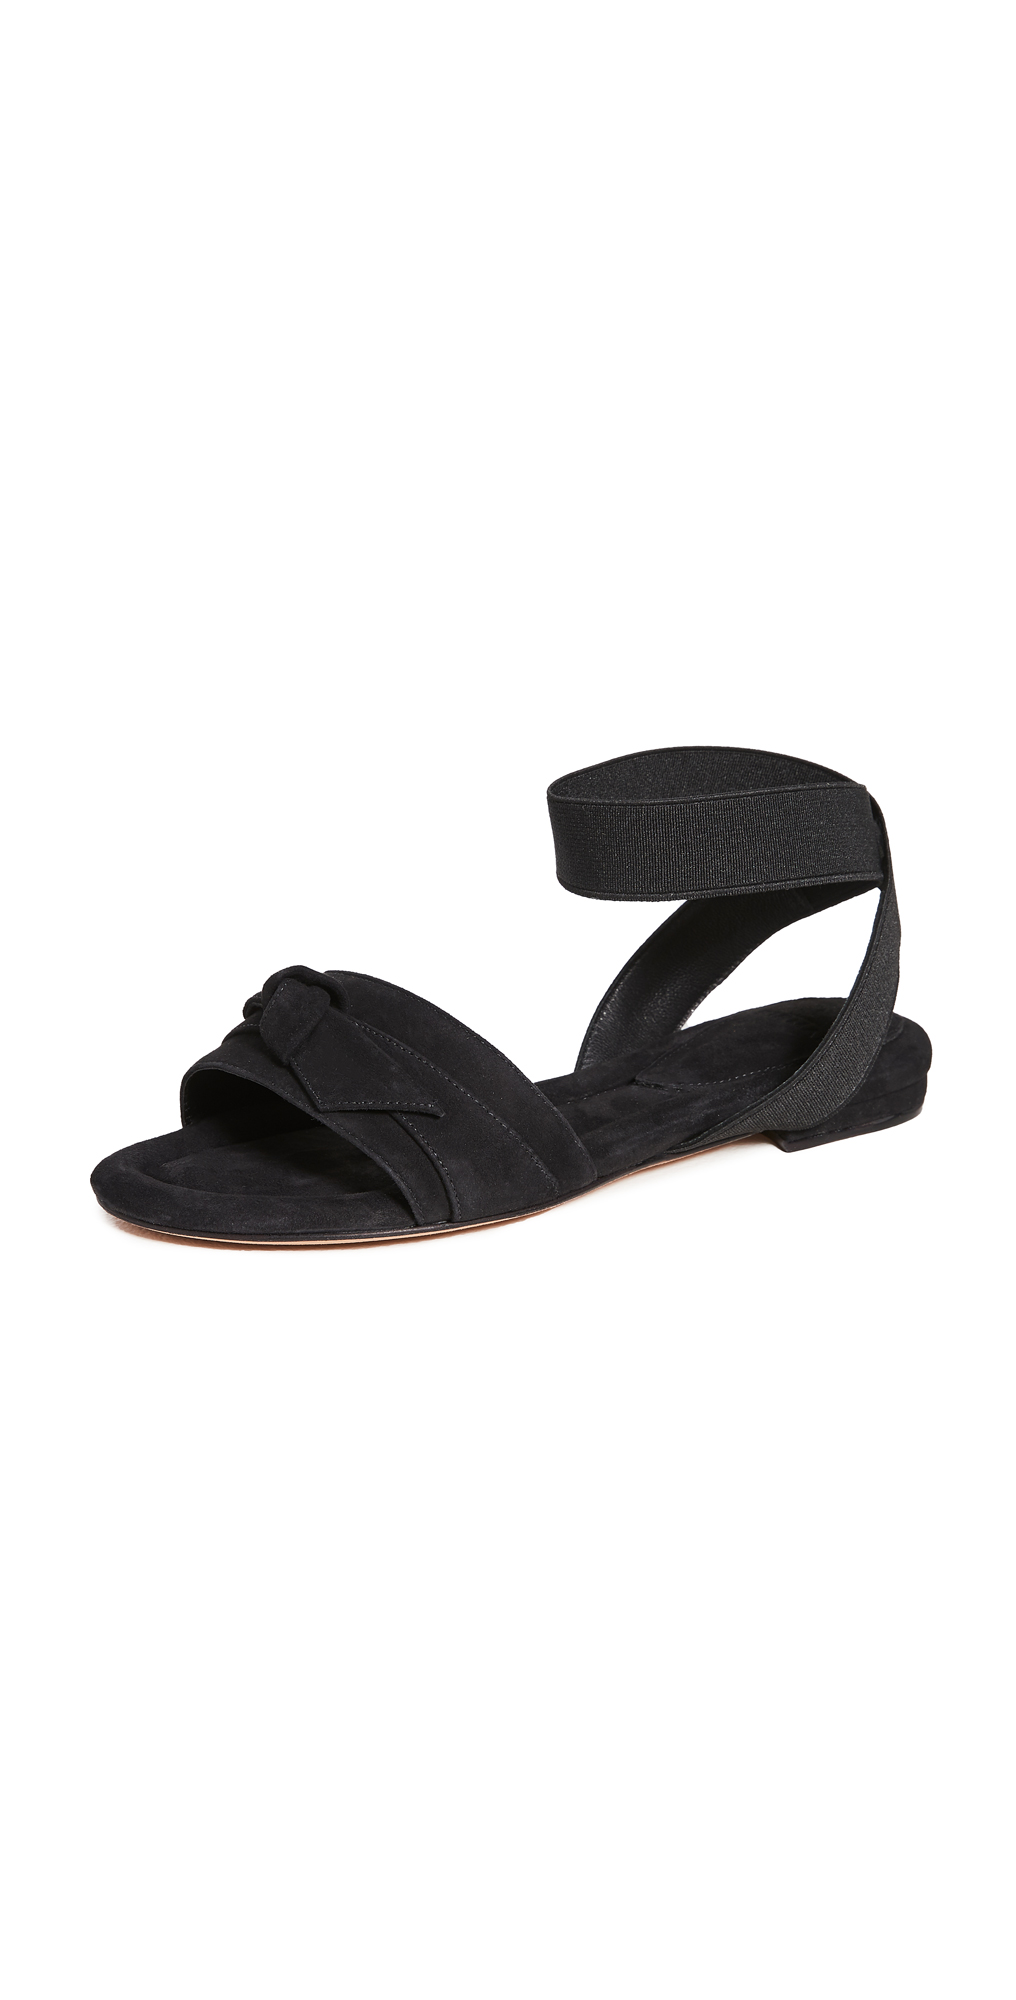 Alexandre Birman Clarita Elastic Flat Sandals